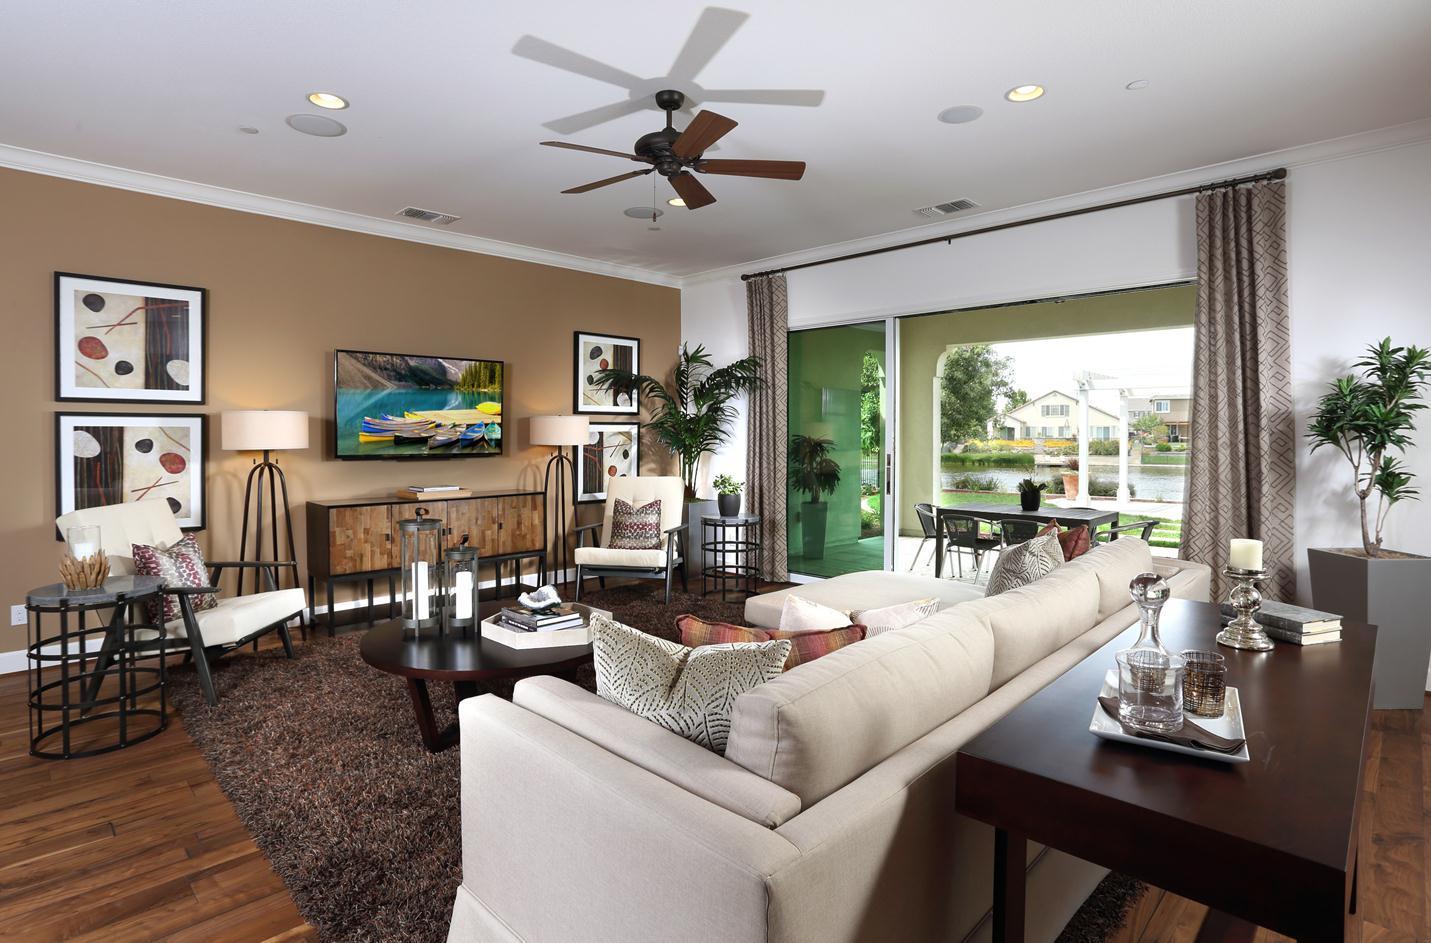 Single Family for Sale at Shoreline Plan 3 2735 Manresa Shore Lane Oakley, California 94561 United States